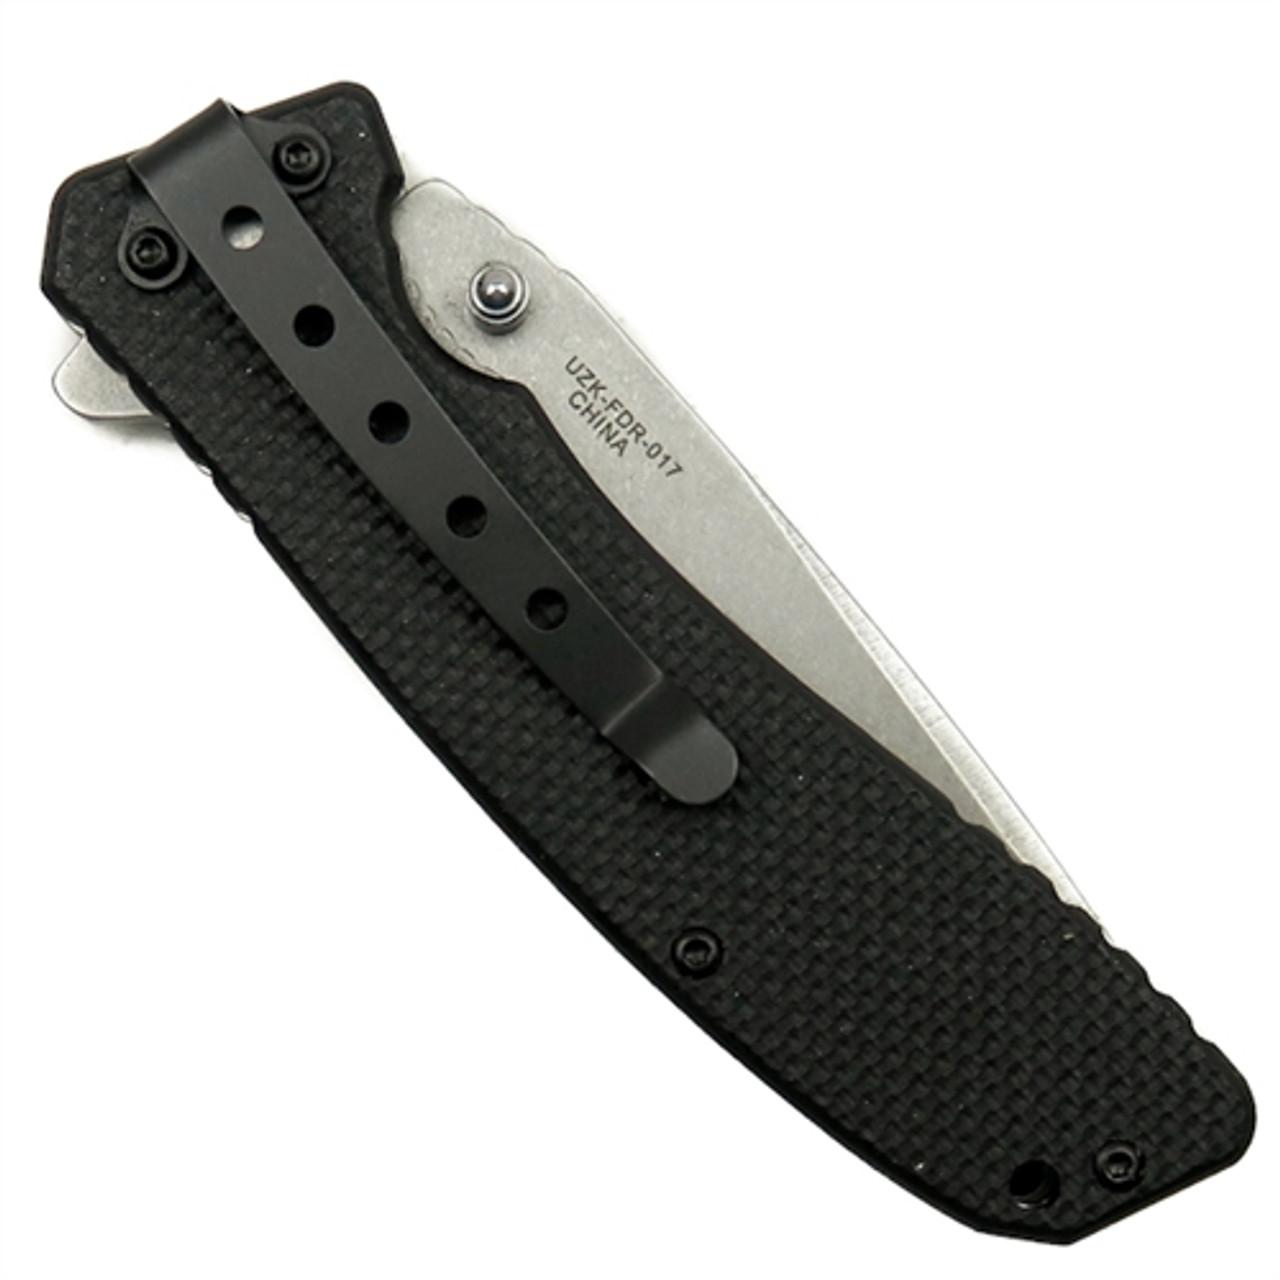 UZI FDR-017 EVN II Spring Assist Knife, Stonewash Combo Blade